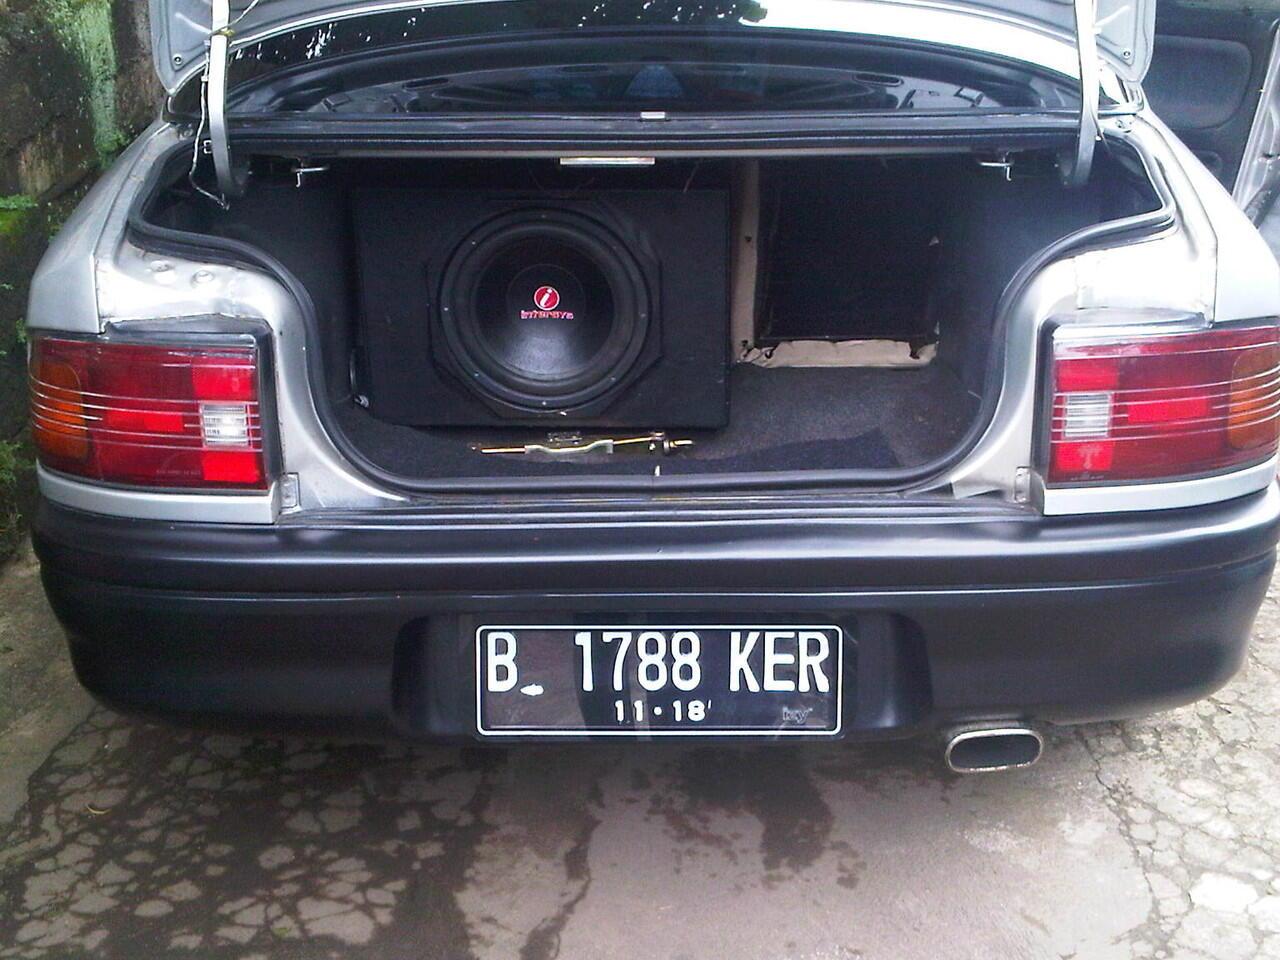 Terjual Mazda Interplay 323 Kaskus Kondensor